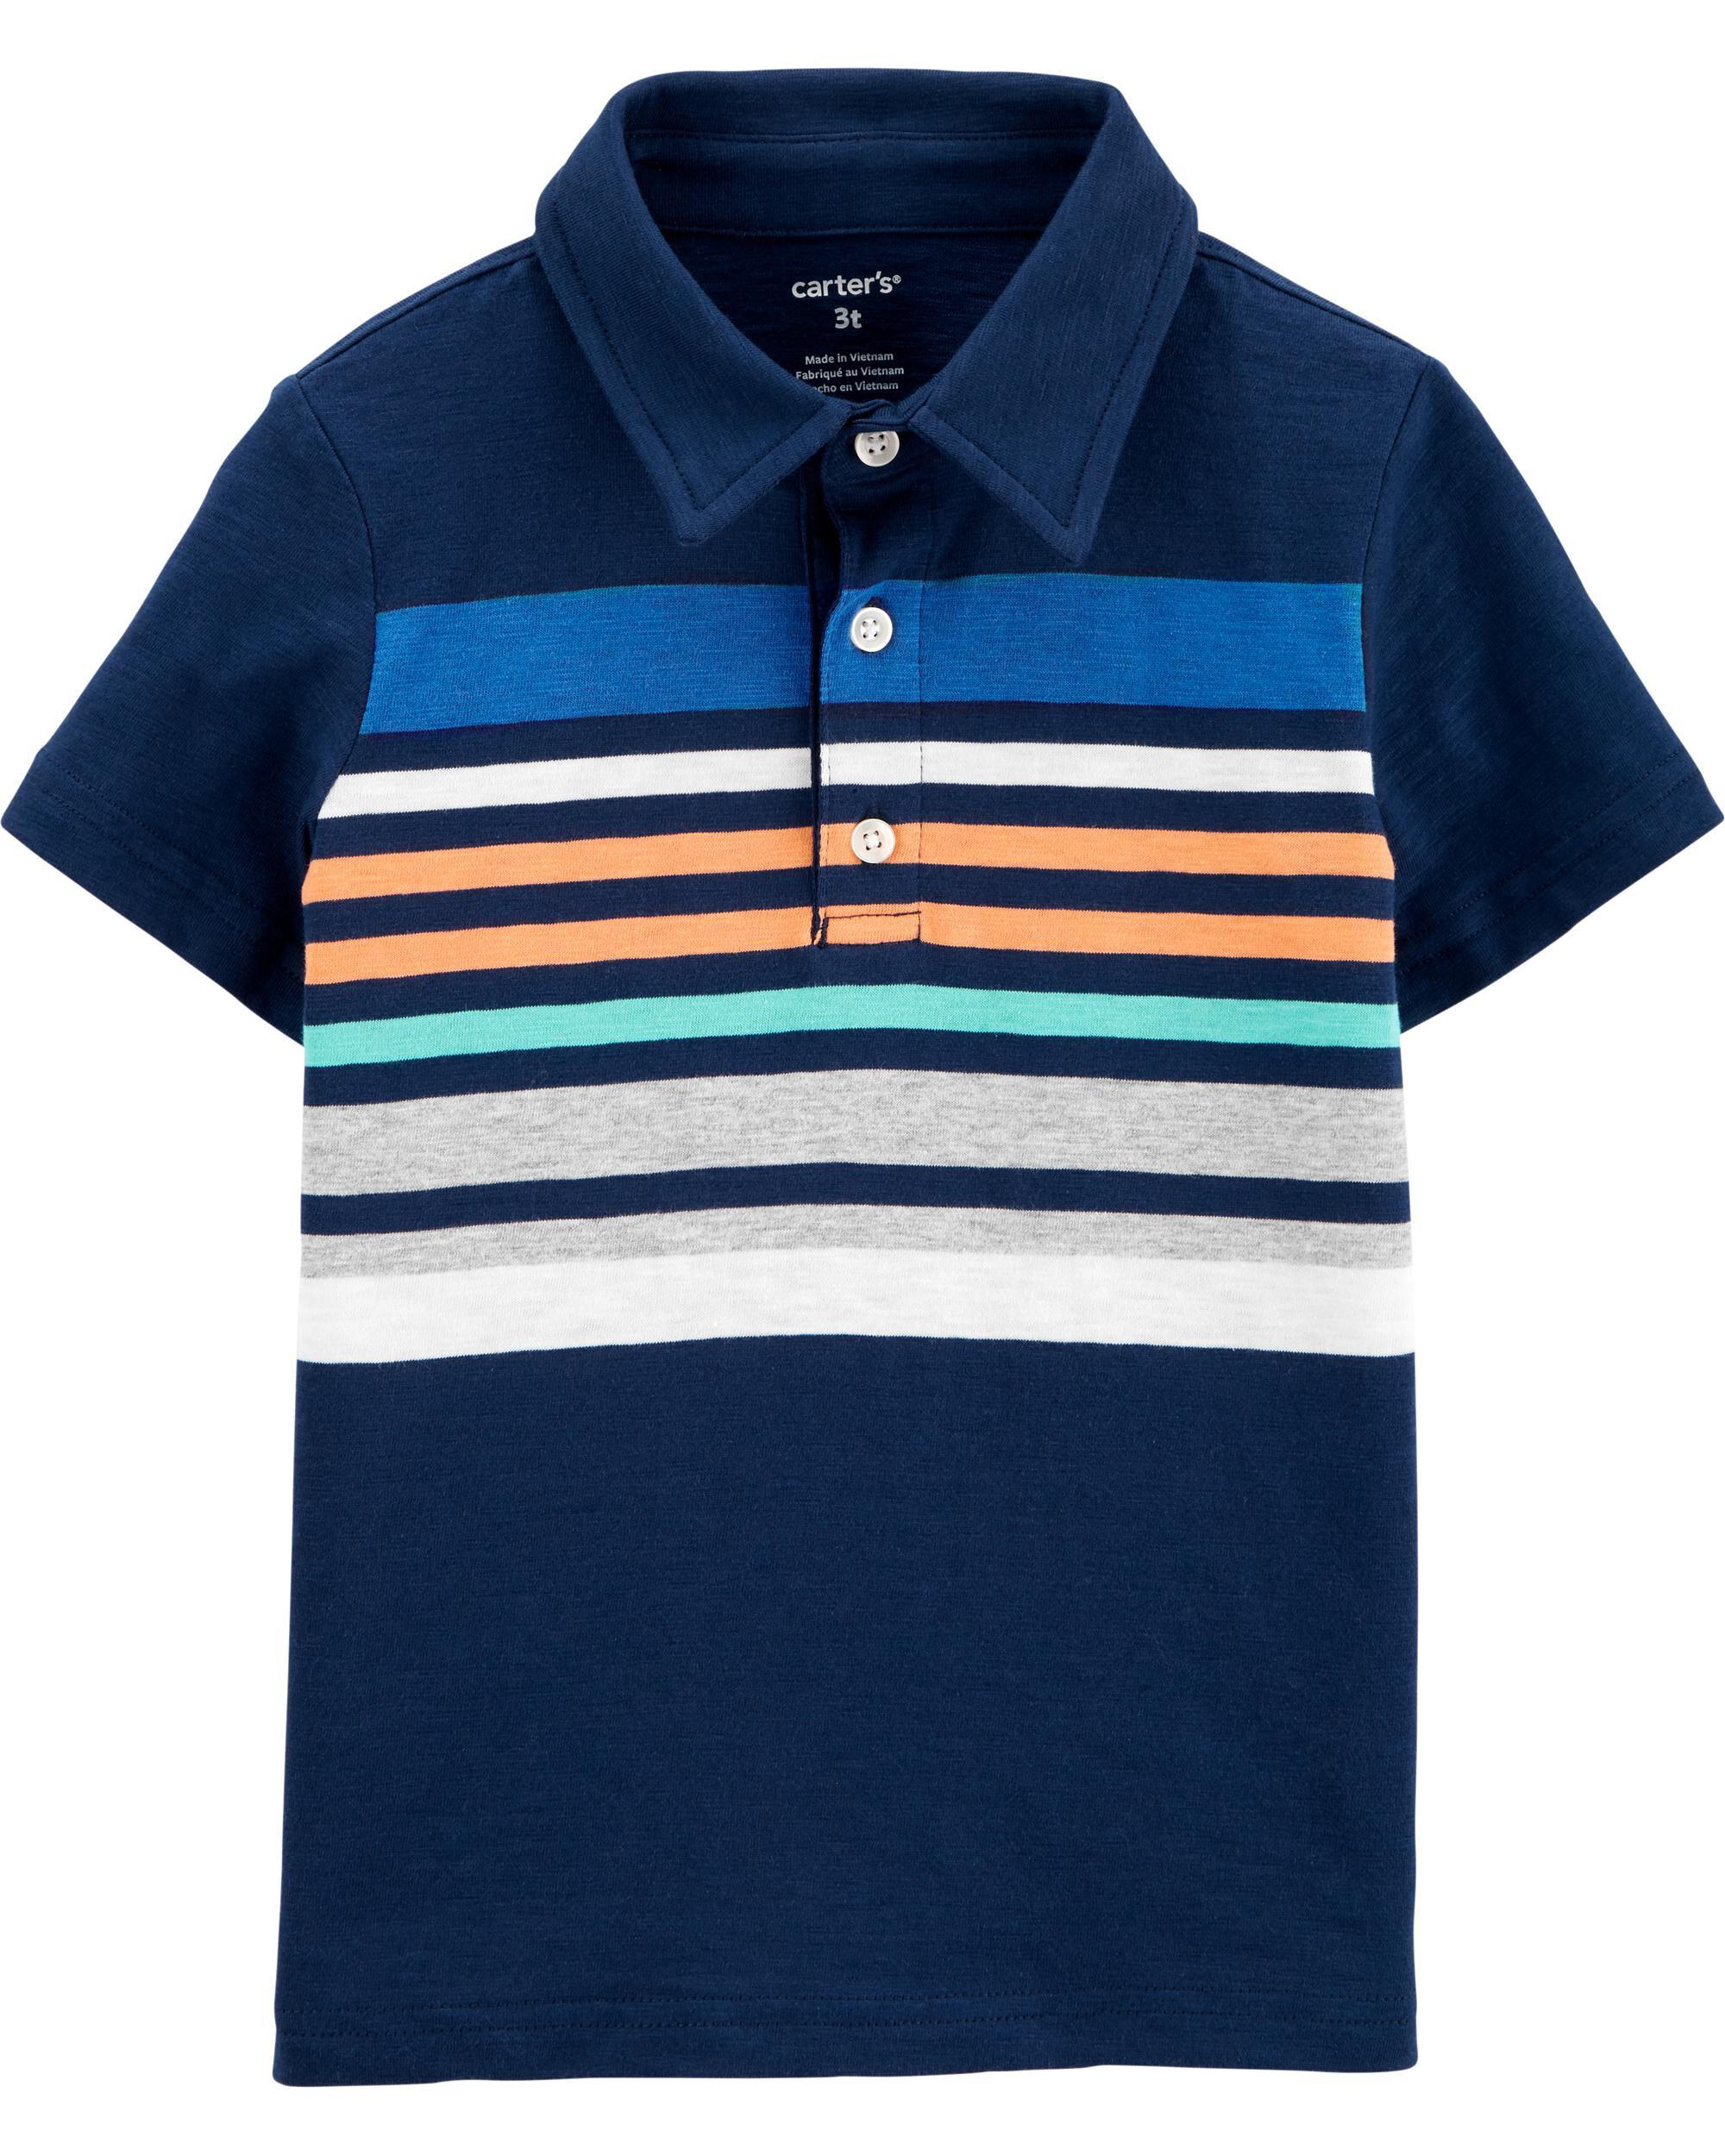 *CLEARANCE* Striped Slub Jersey Polo